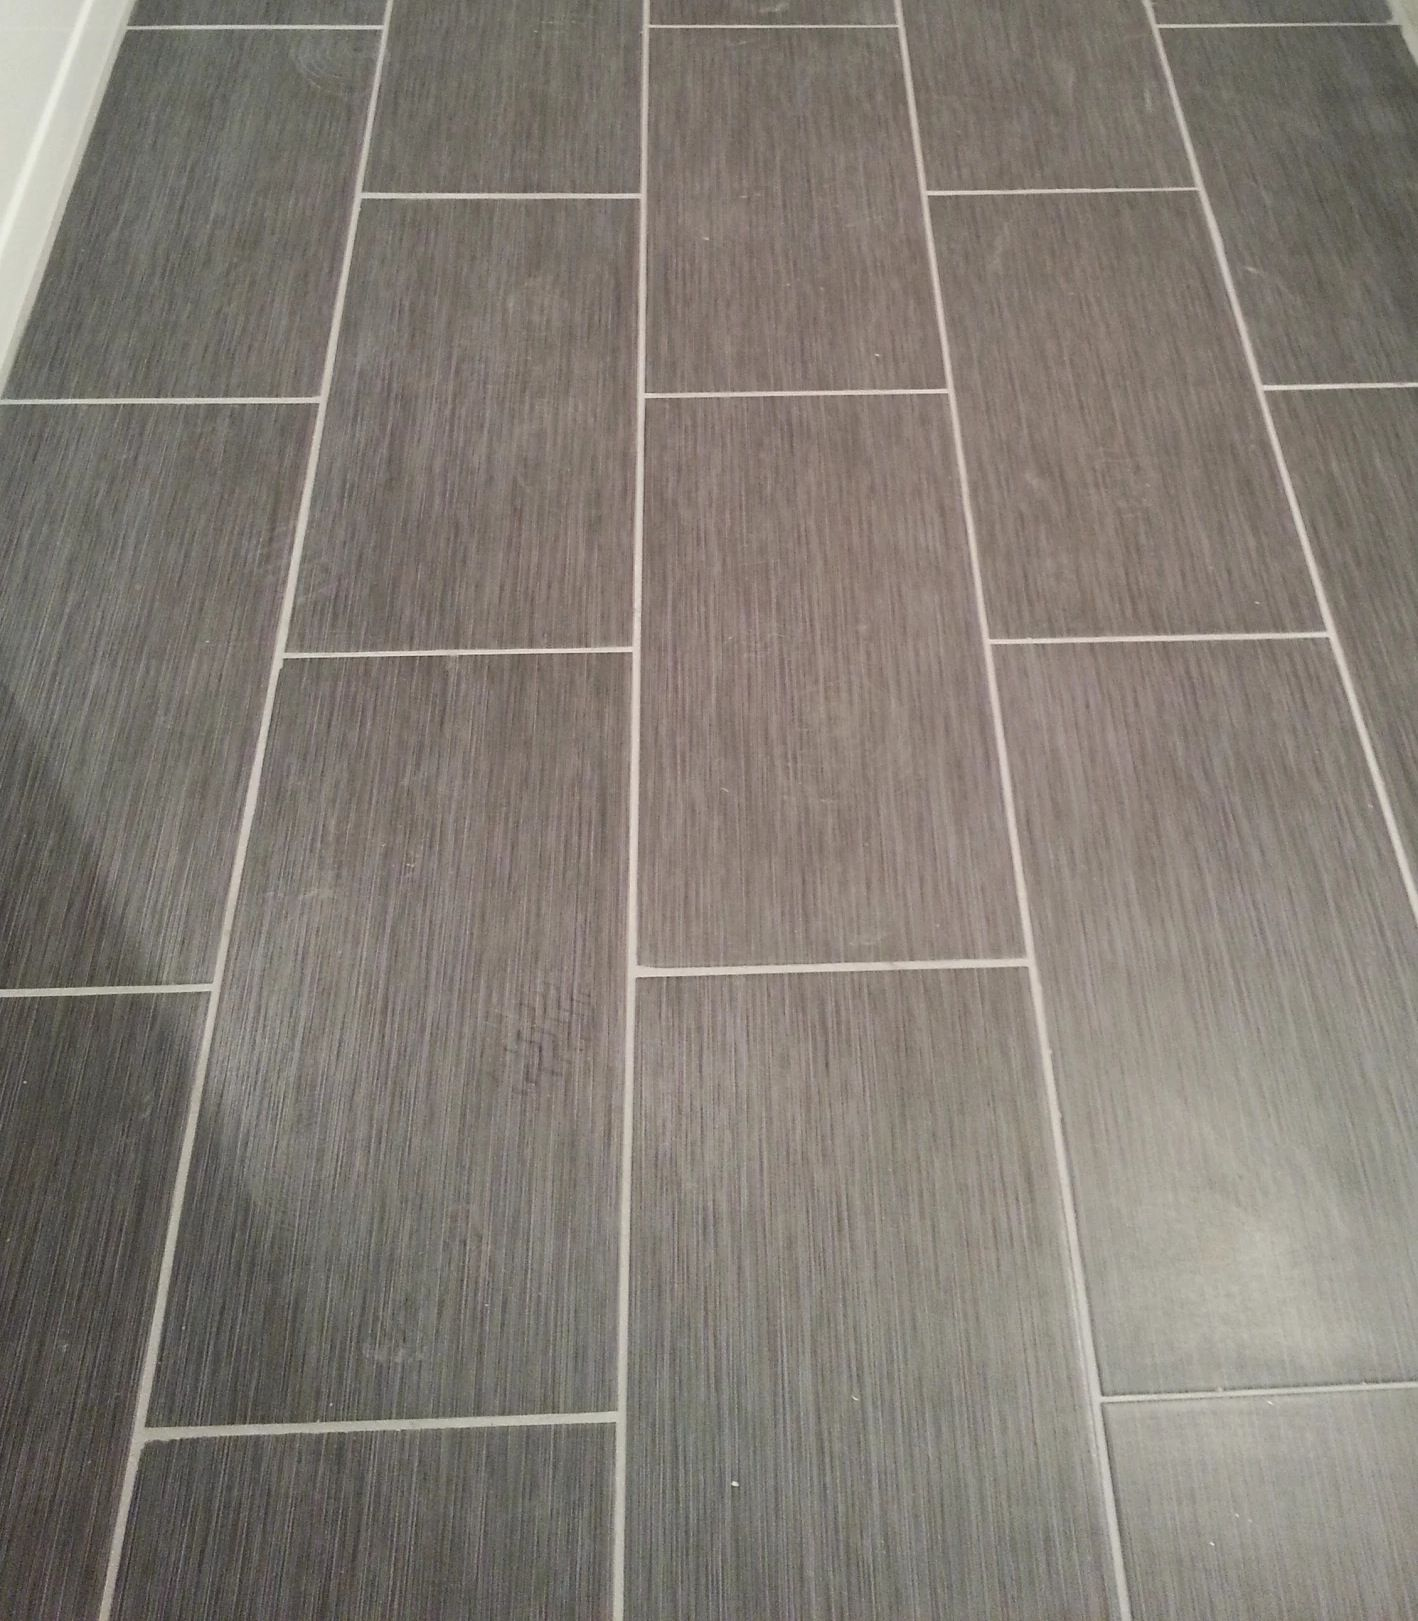 Home Depot Kitchen Floor Tiles Home Depot Metro Gris B A T H Pinterest Dark Home And We